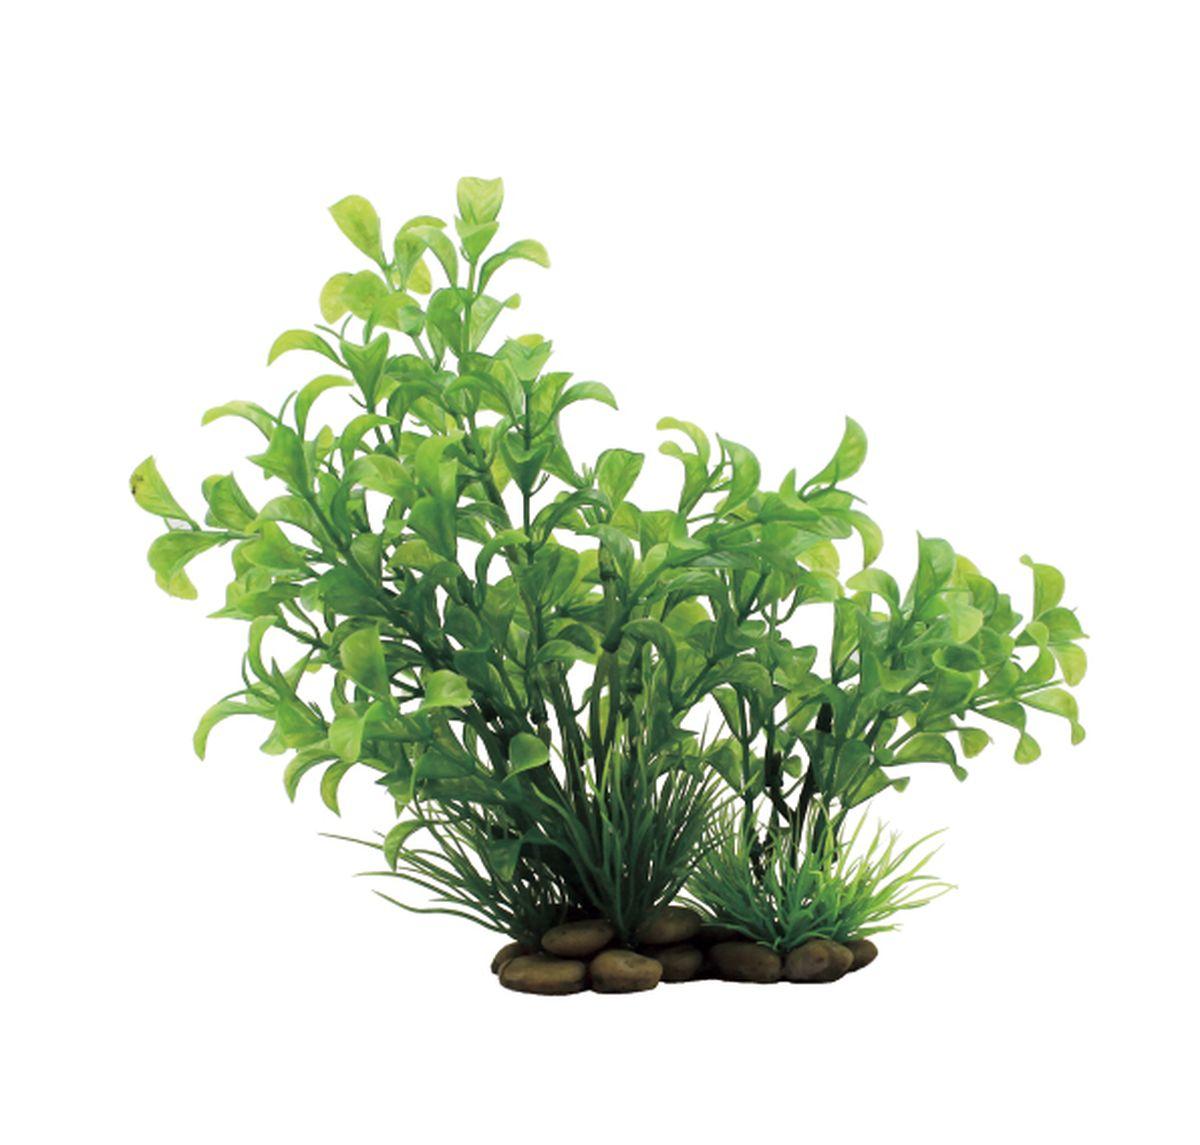 Растение для аквариума ArtUniq Людвигия зеленая, высота 20 смART-1150306Растение для аквариума ArtUniq Людвигия зеленая, высота 20 см